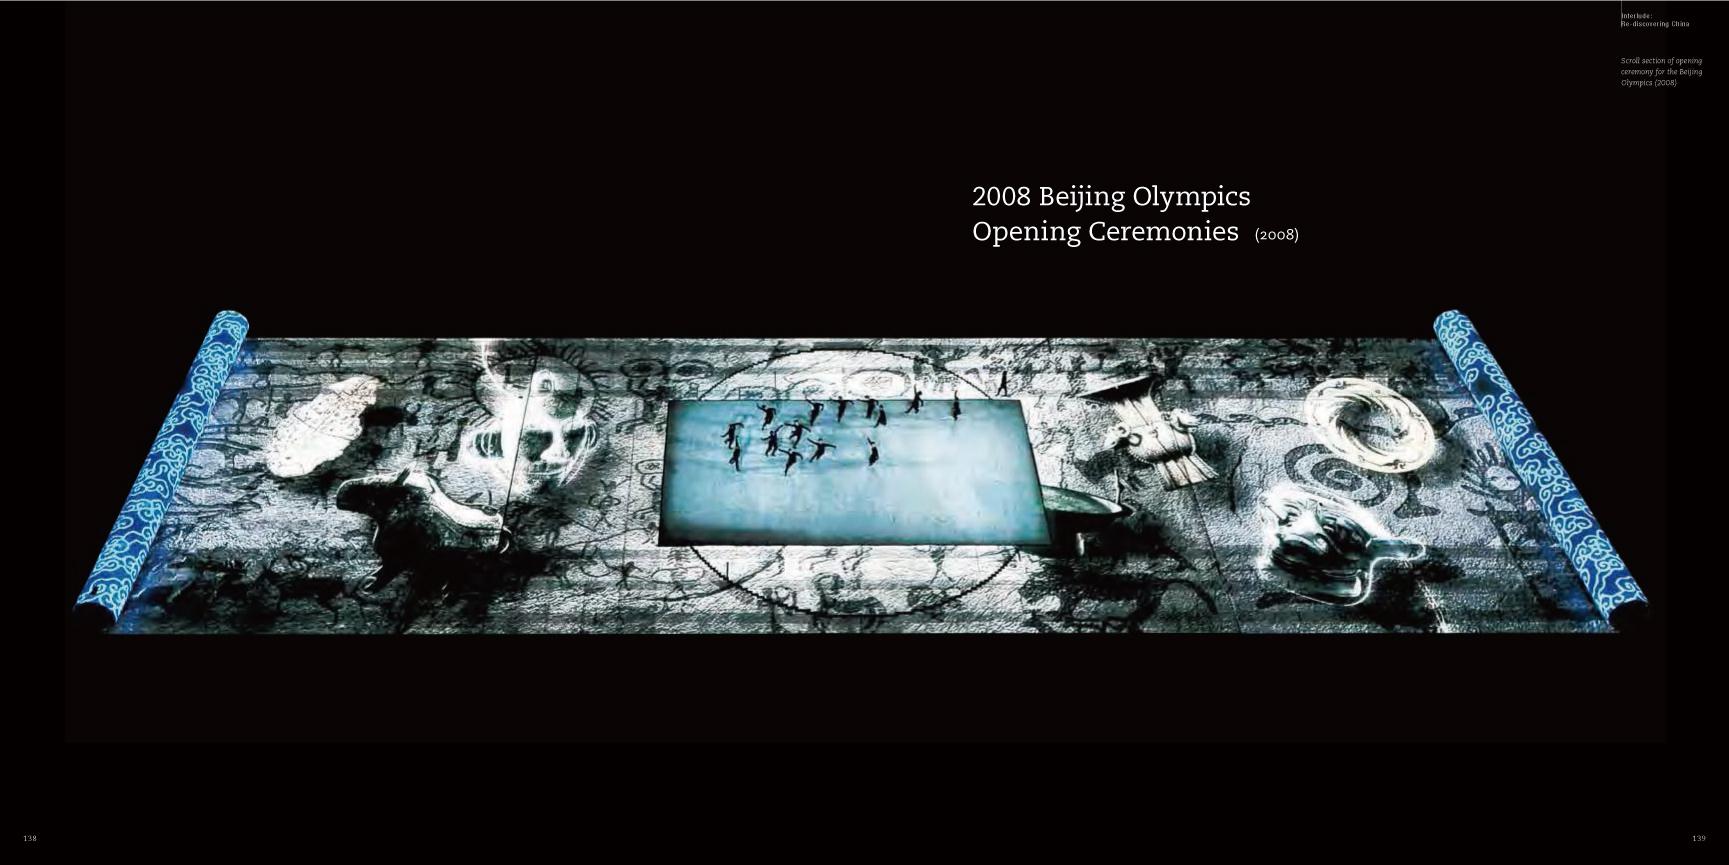 Olympic opening photo 2.jpg